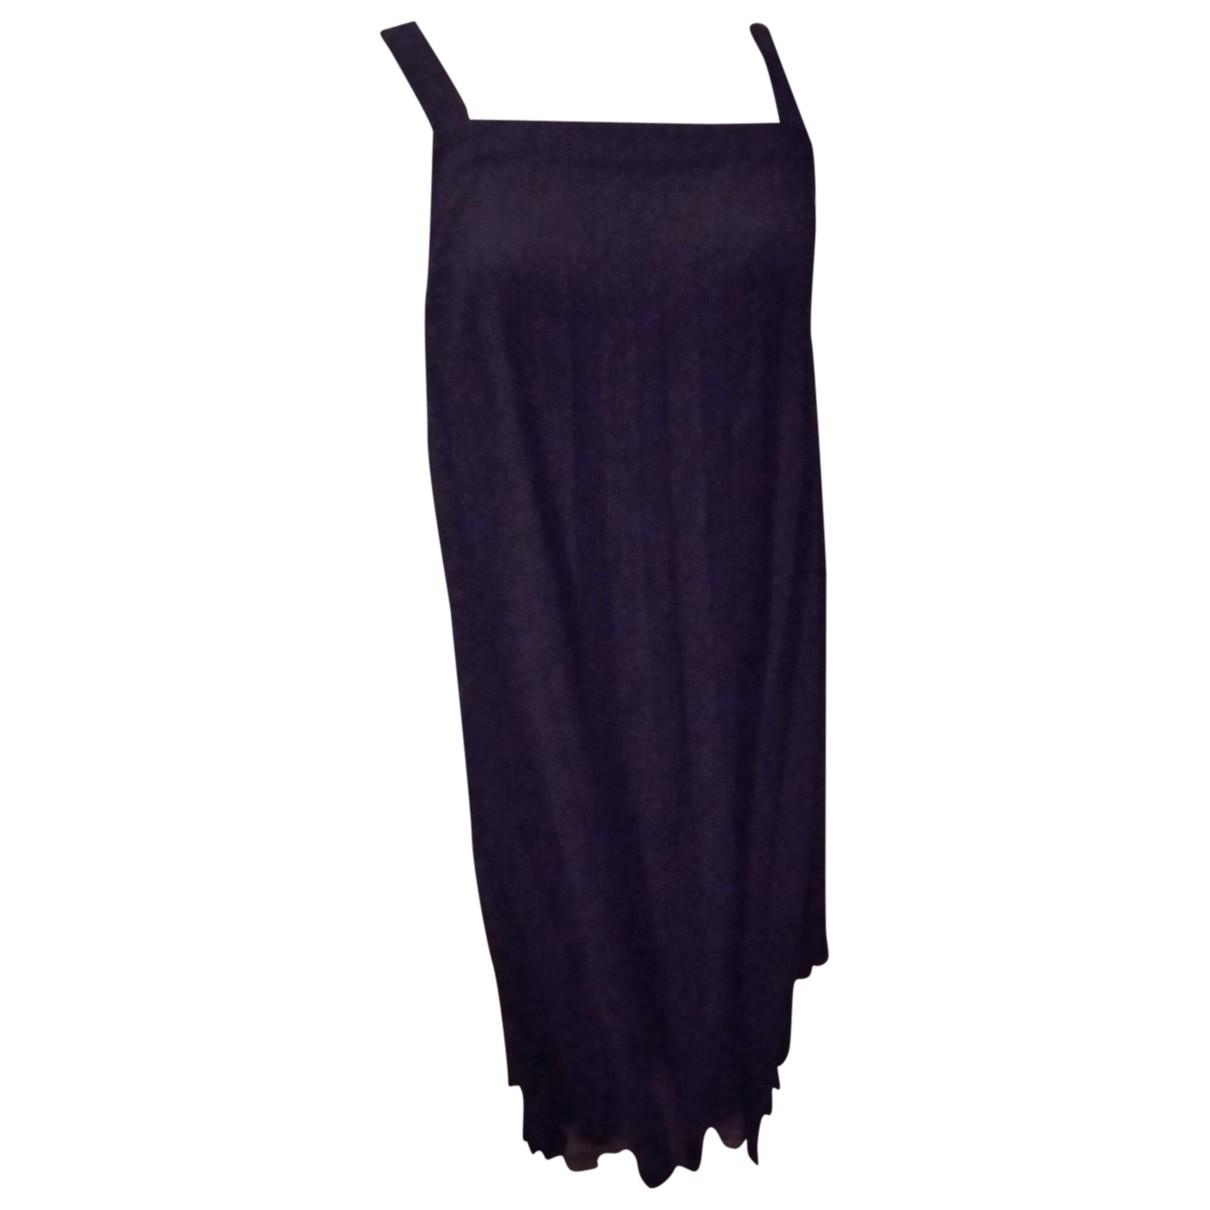 Zapa \N Kleid in  Schwarz Viskose